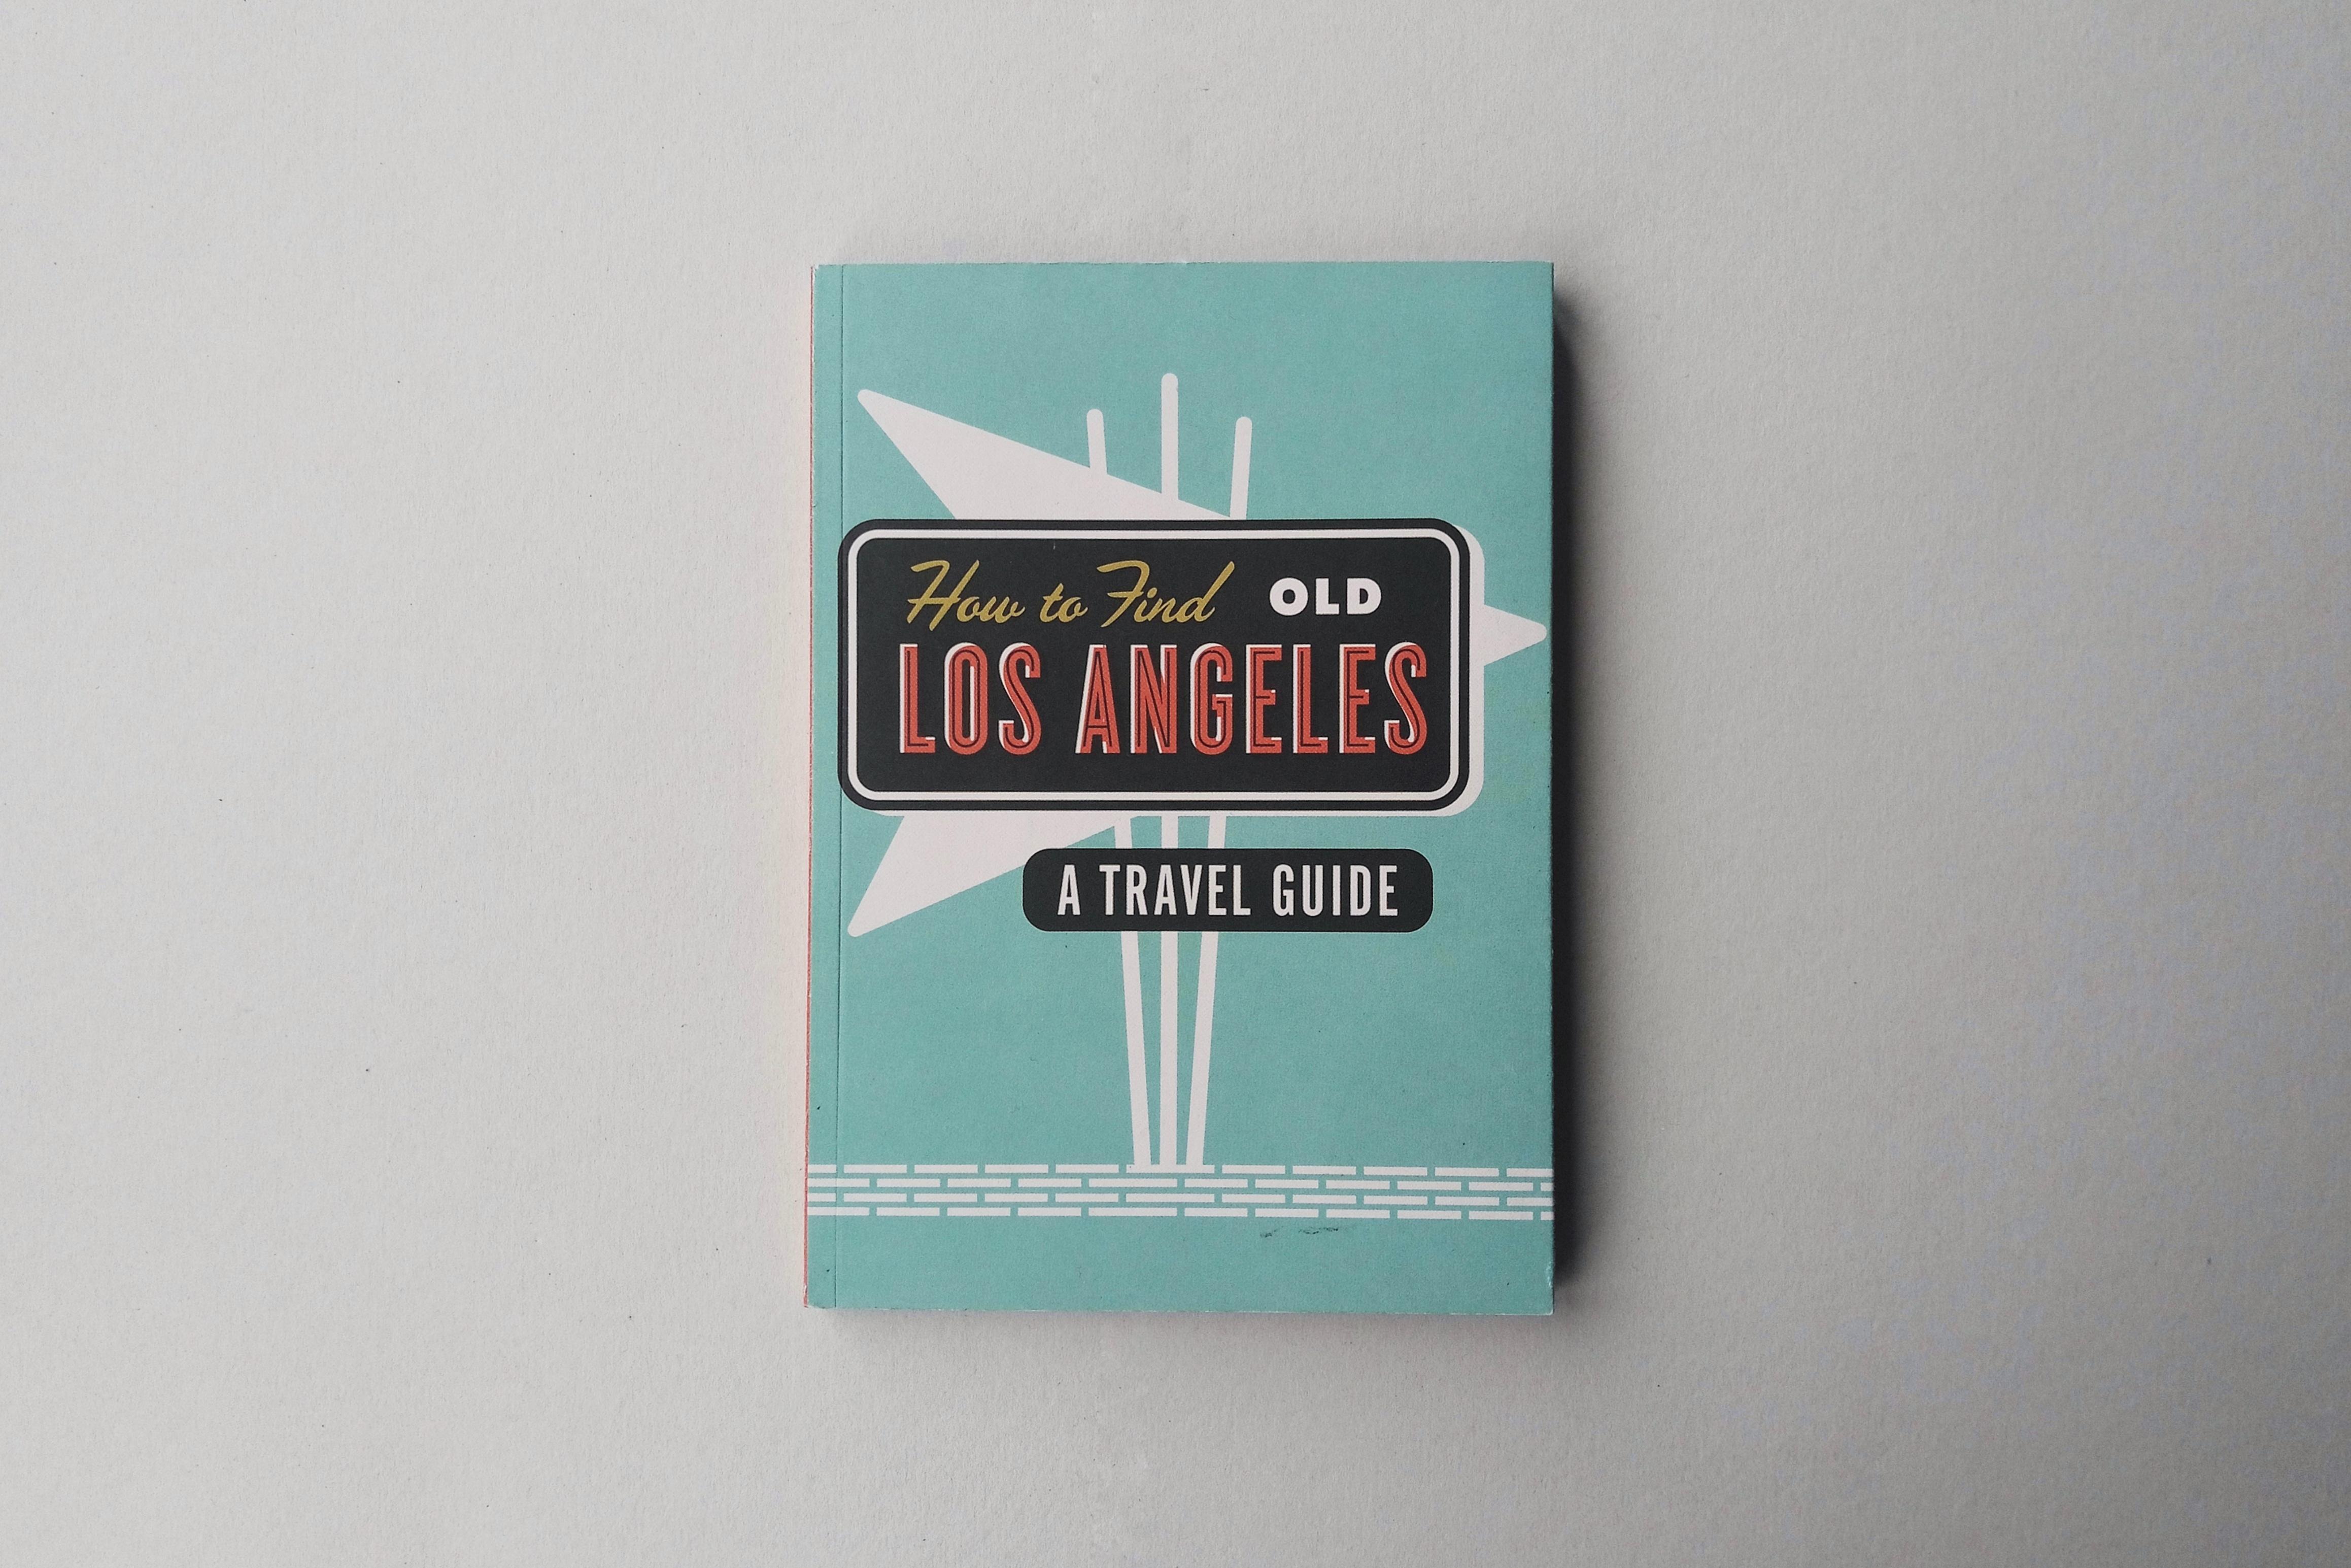 Herb Lester Guides